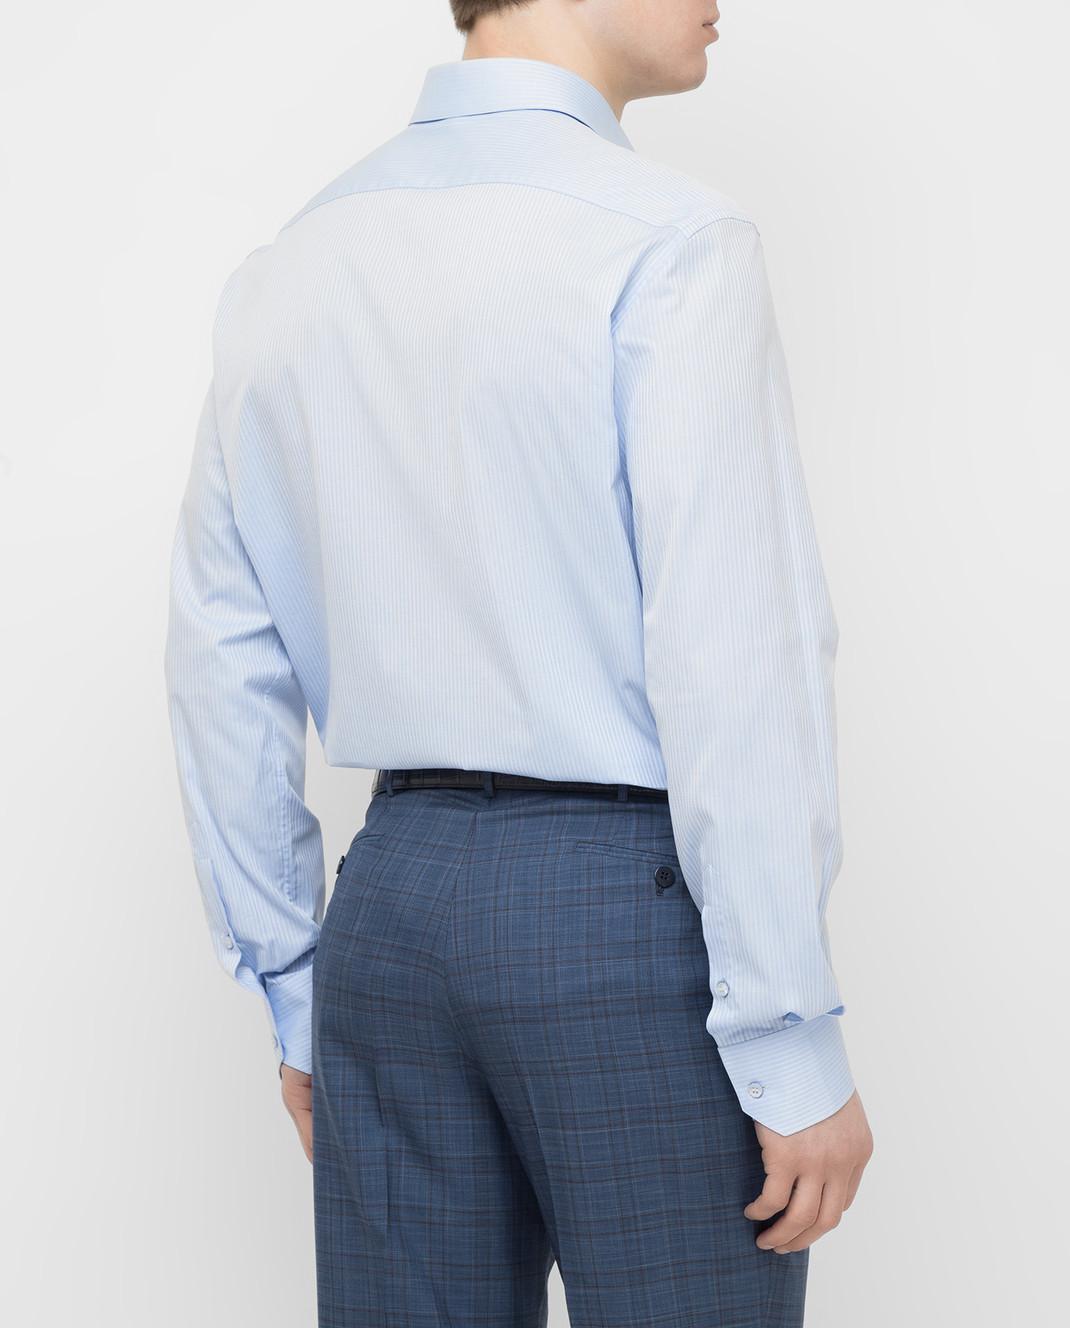 Stefano Ricci Голубая рубашка MC000540L1803 изображение 4